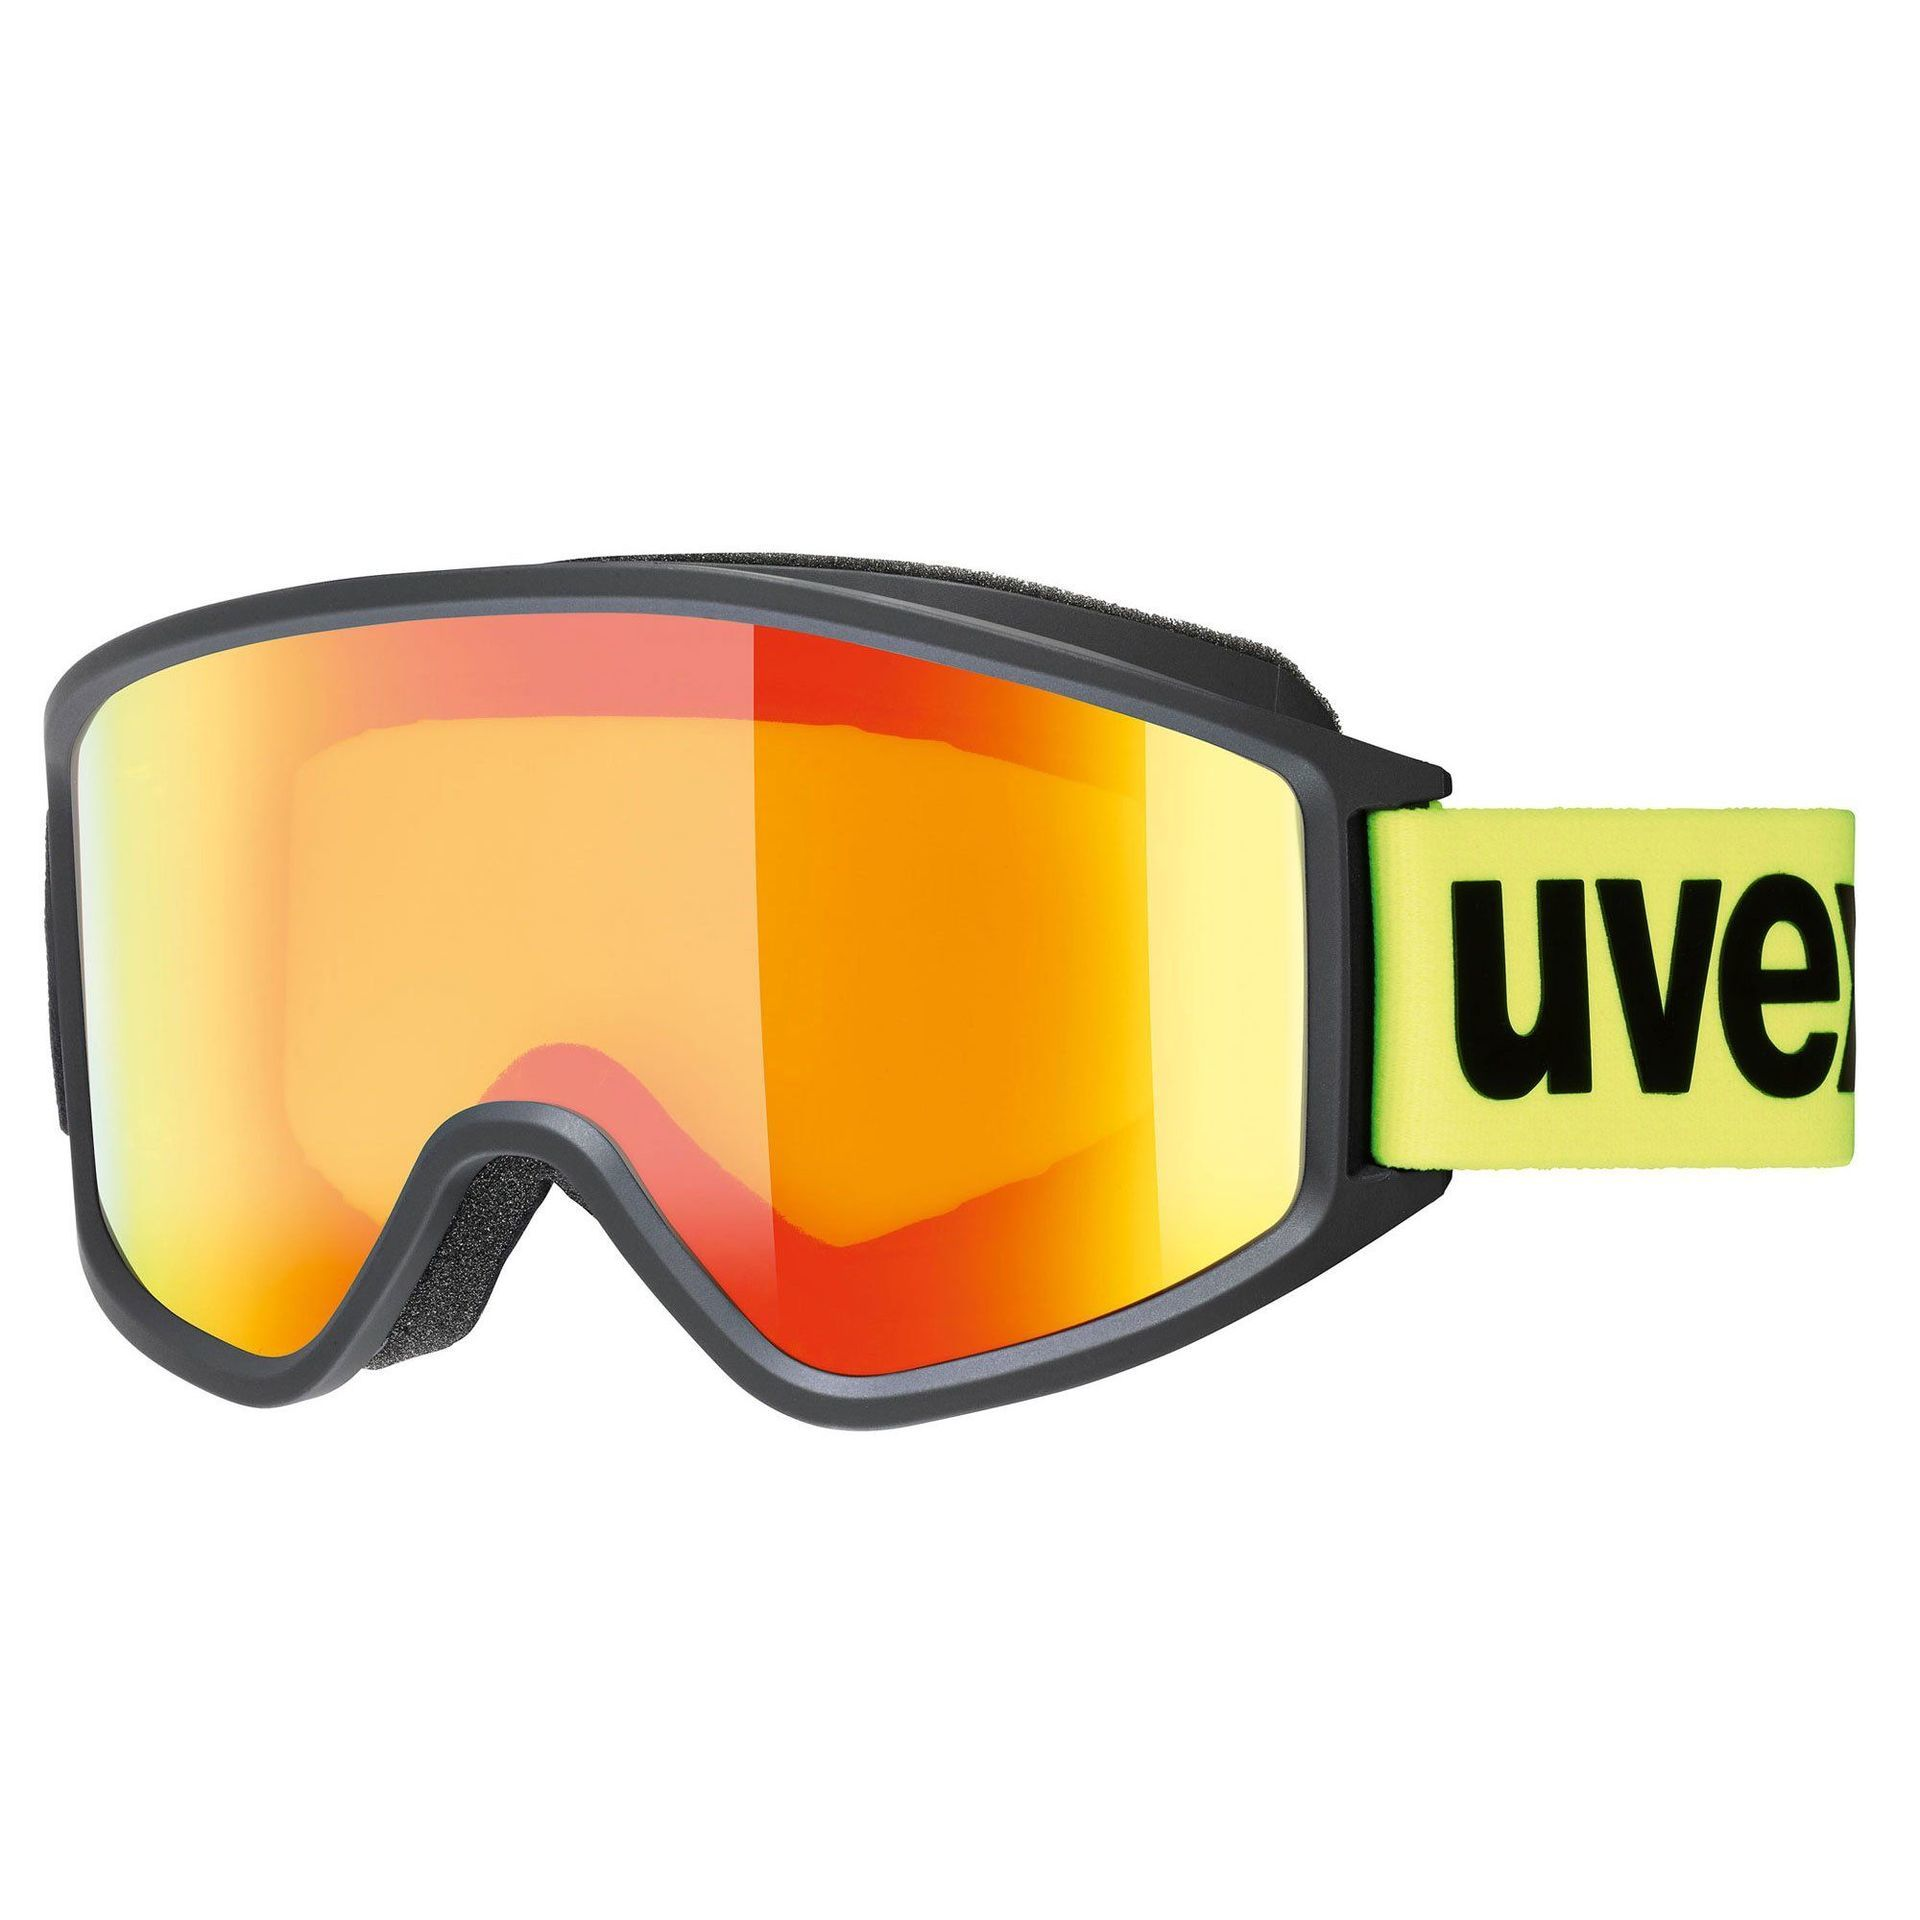 GOGLE UVEX G.GL 3000 CV YELLOW LIME MAT MIRROR ORANGE COLORVISION YELLOW 55 1 333 2230